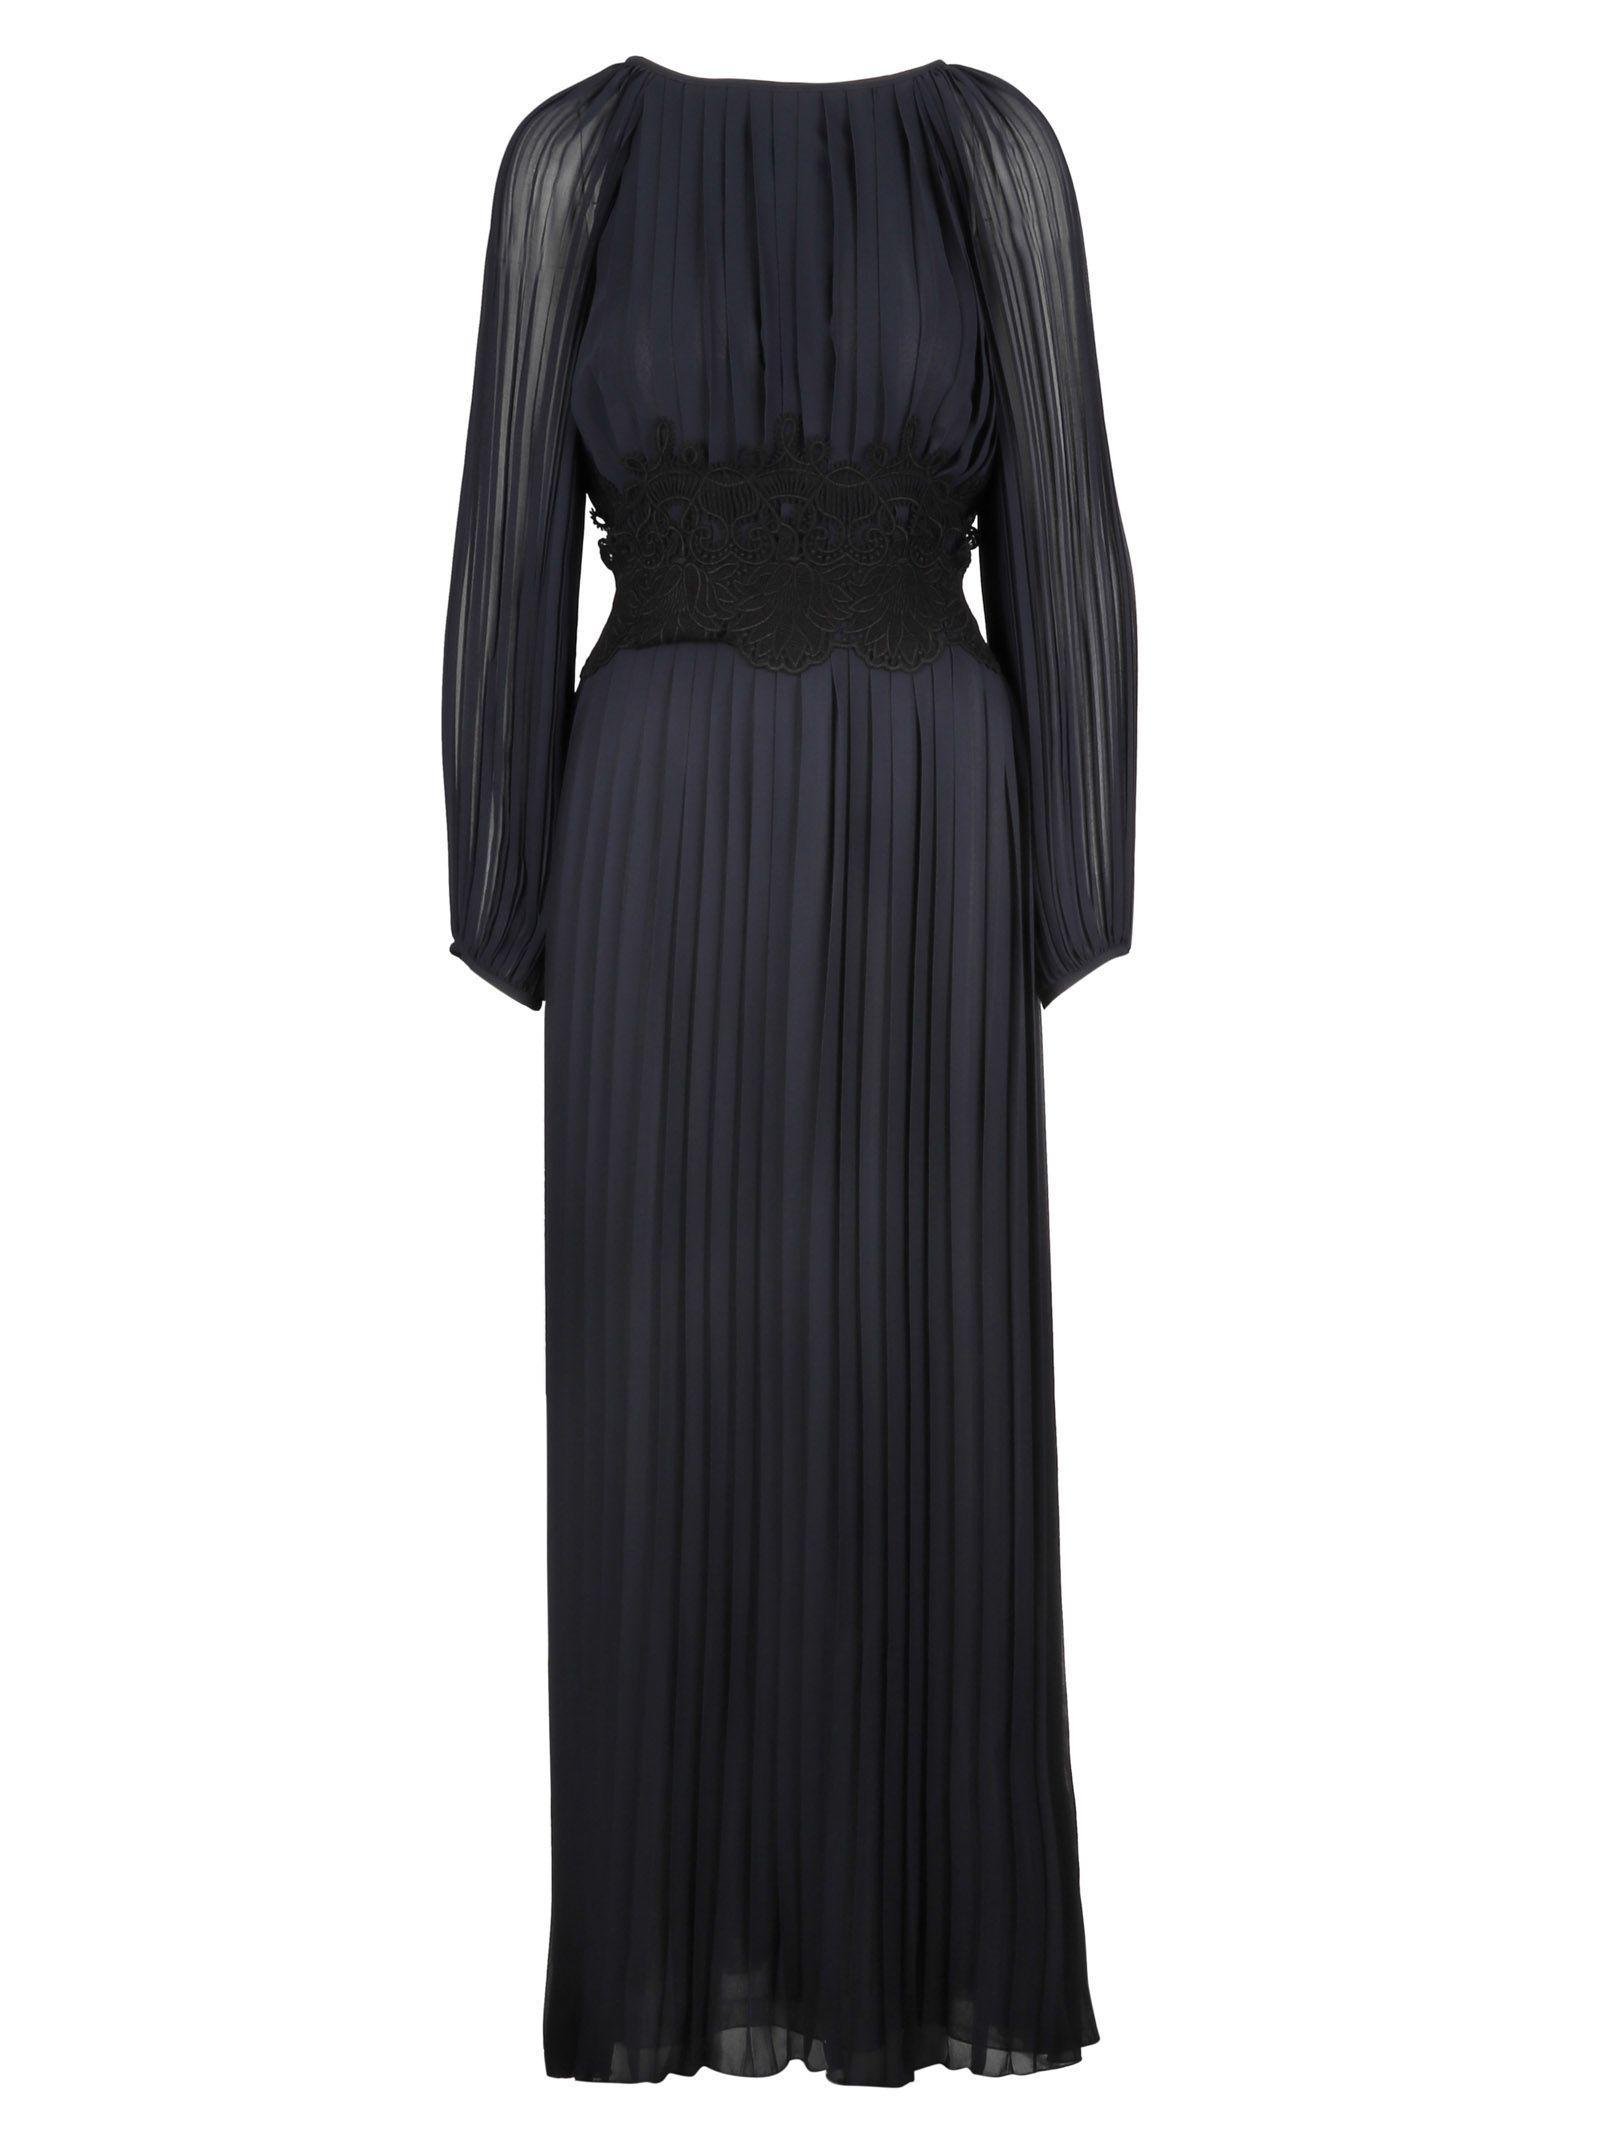 Parosh P.a.r.o.s.h. Long Pleated Dress In Basic